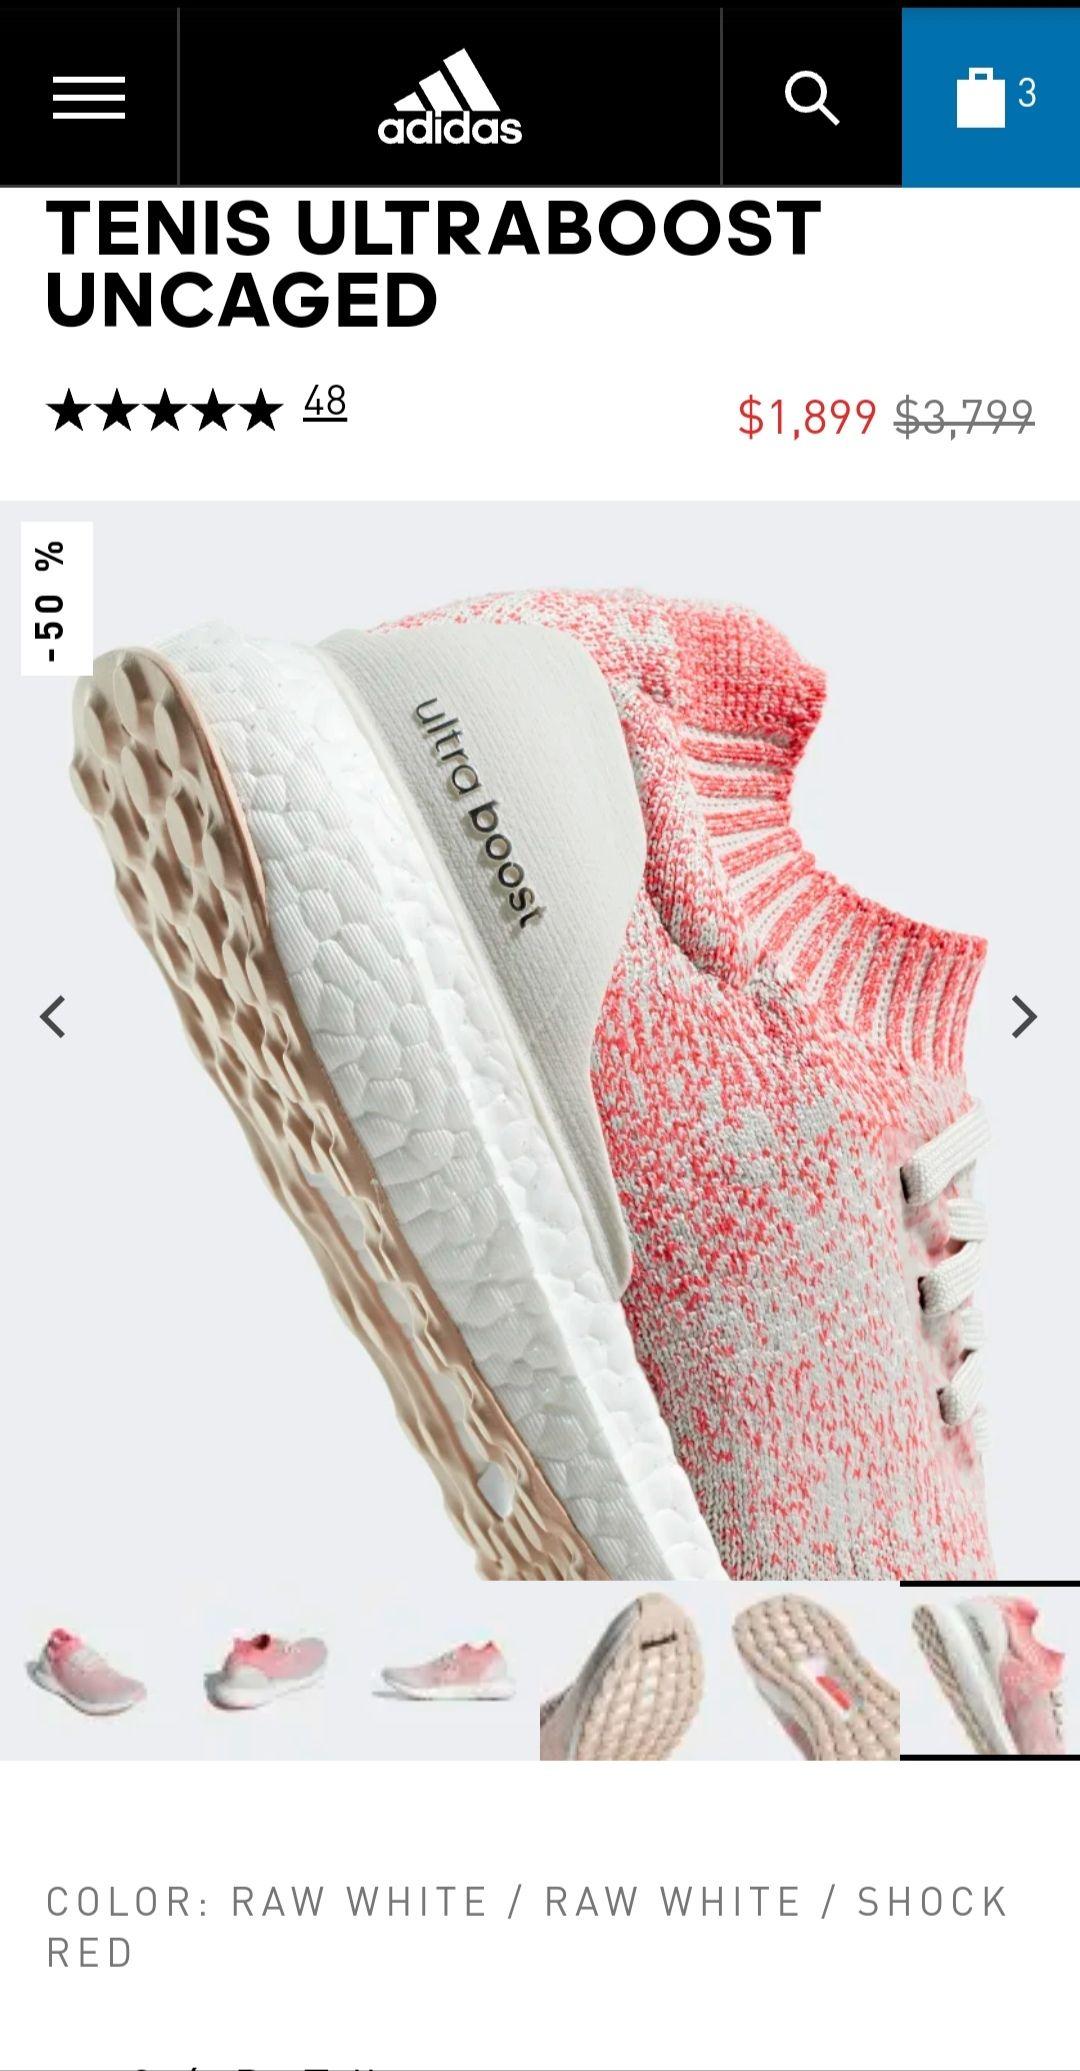 Adidas: Ultraboost Uncaged Dama